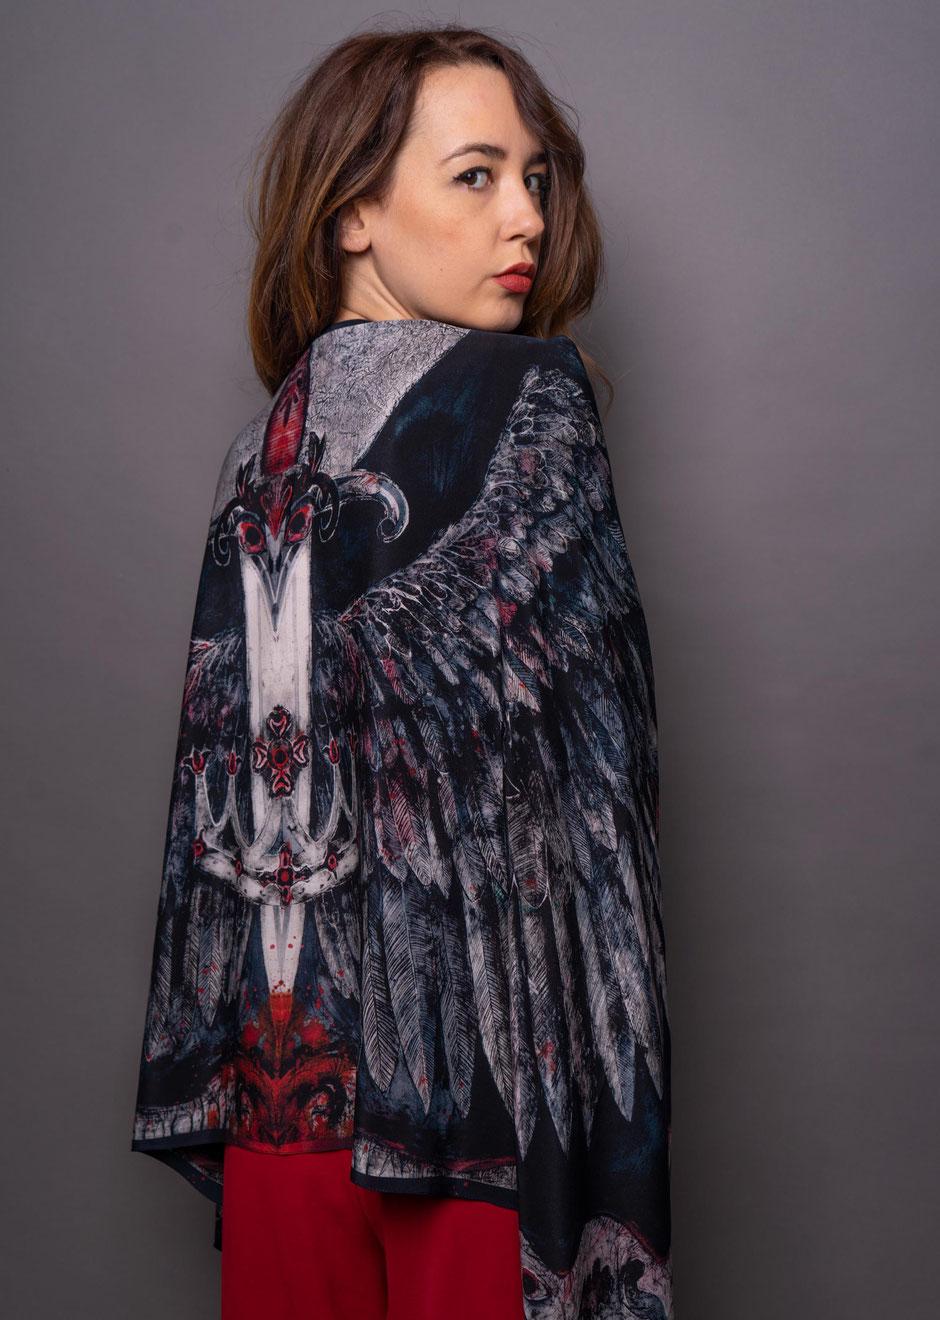 hurly burly romantic macabre crepe de chene designer silk scarf